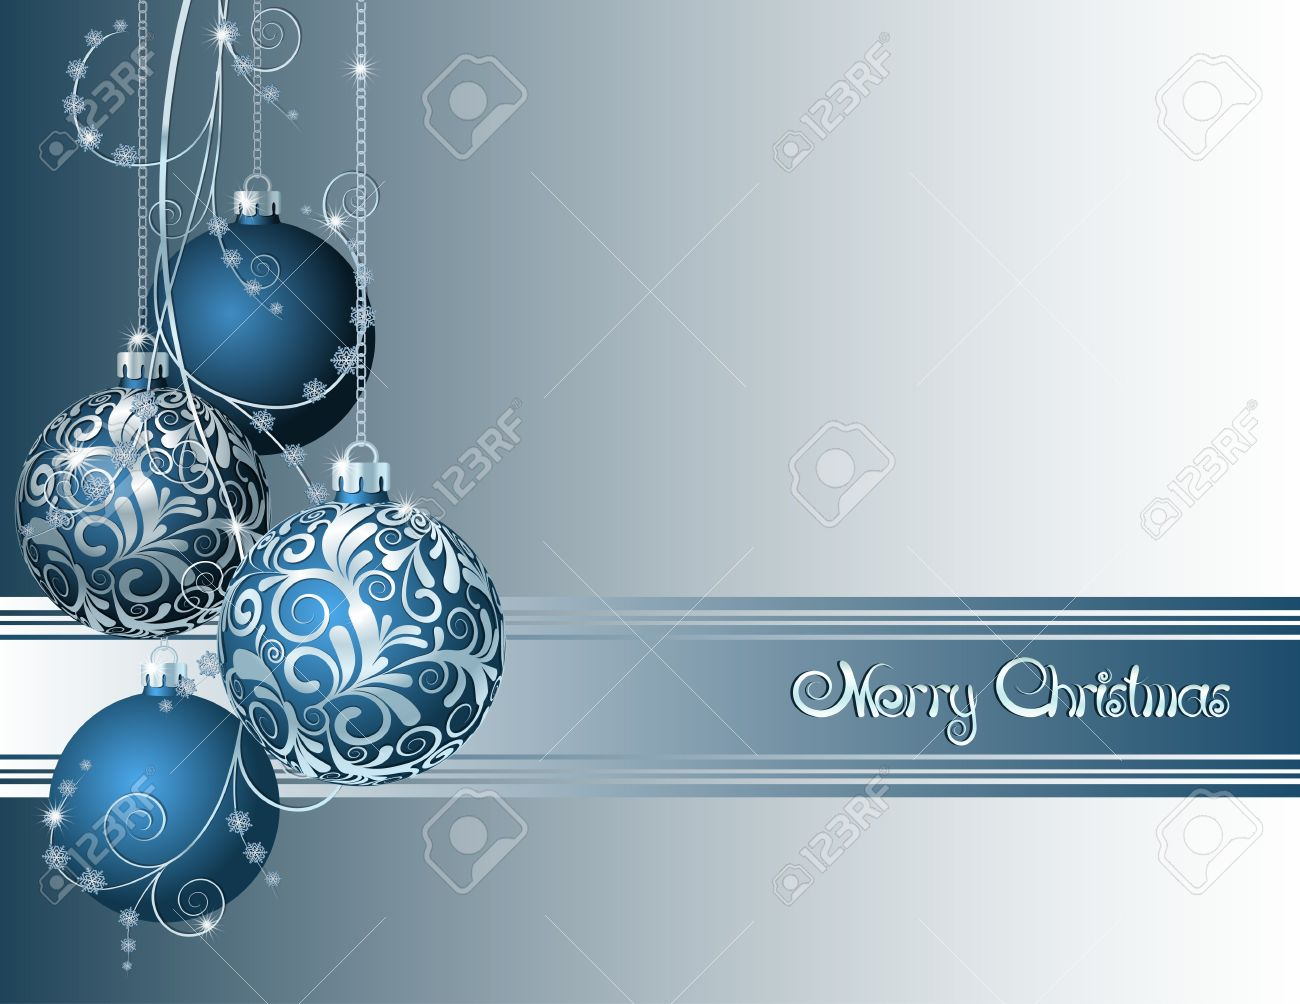 Blue Christmas card with Christmas balls and snowflakes Stock Vector - 16132959